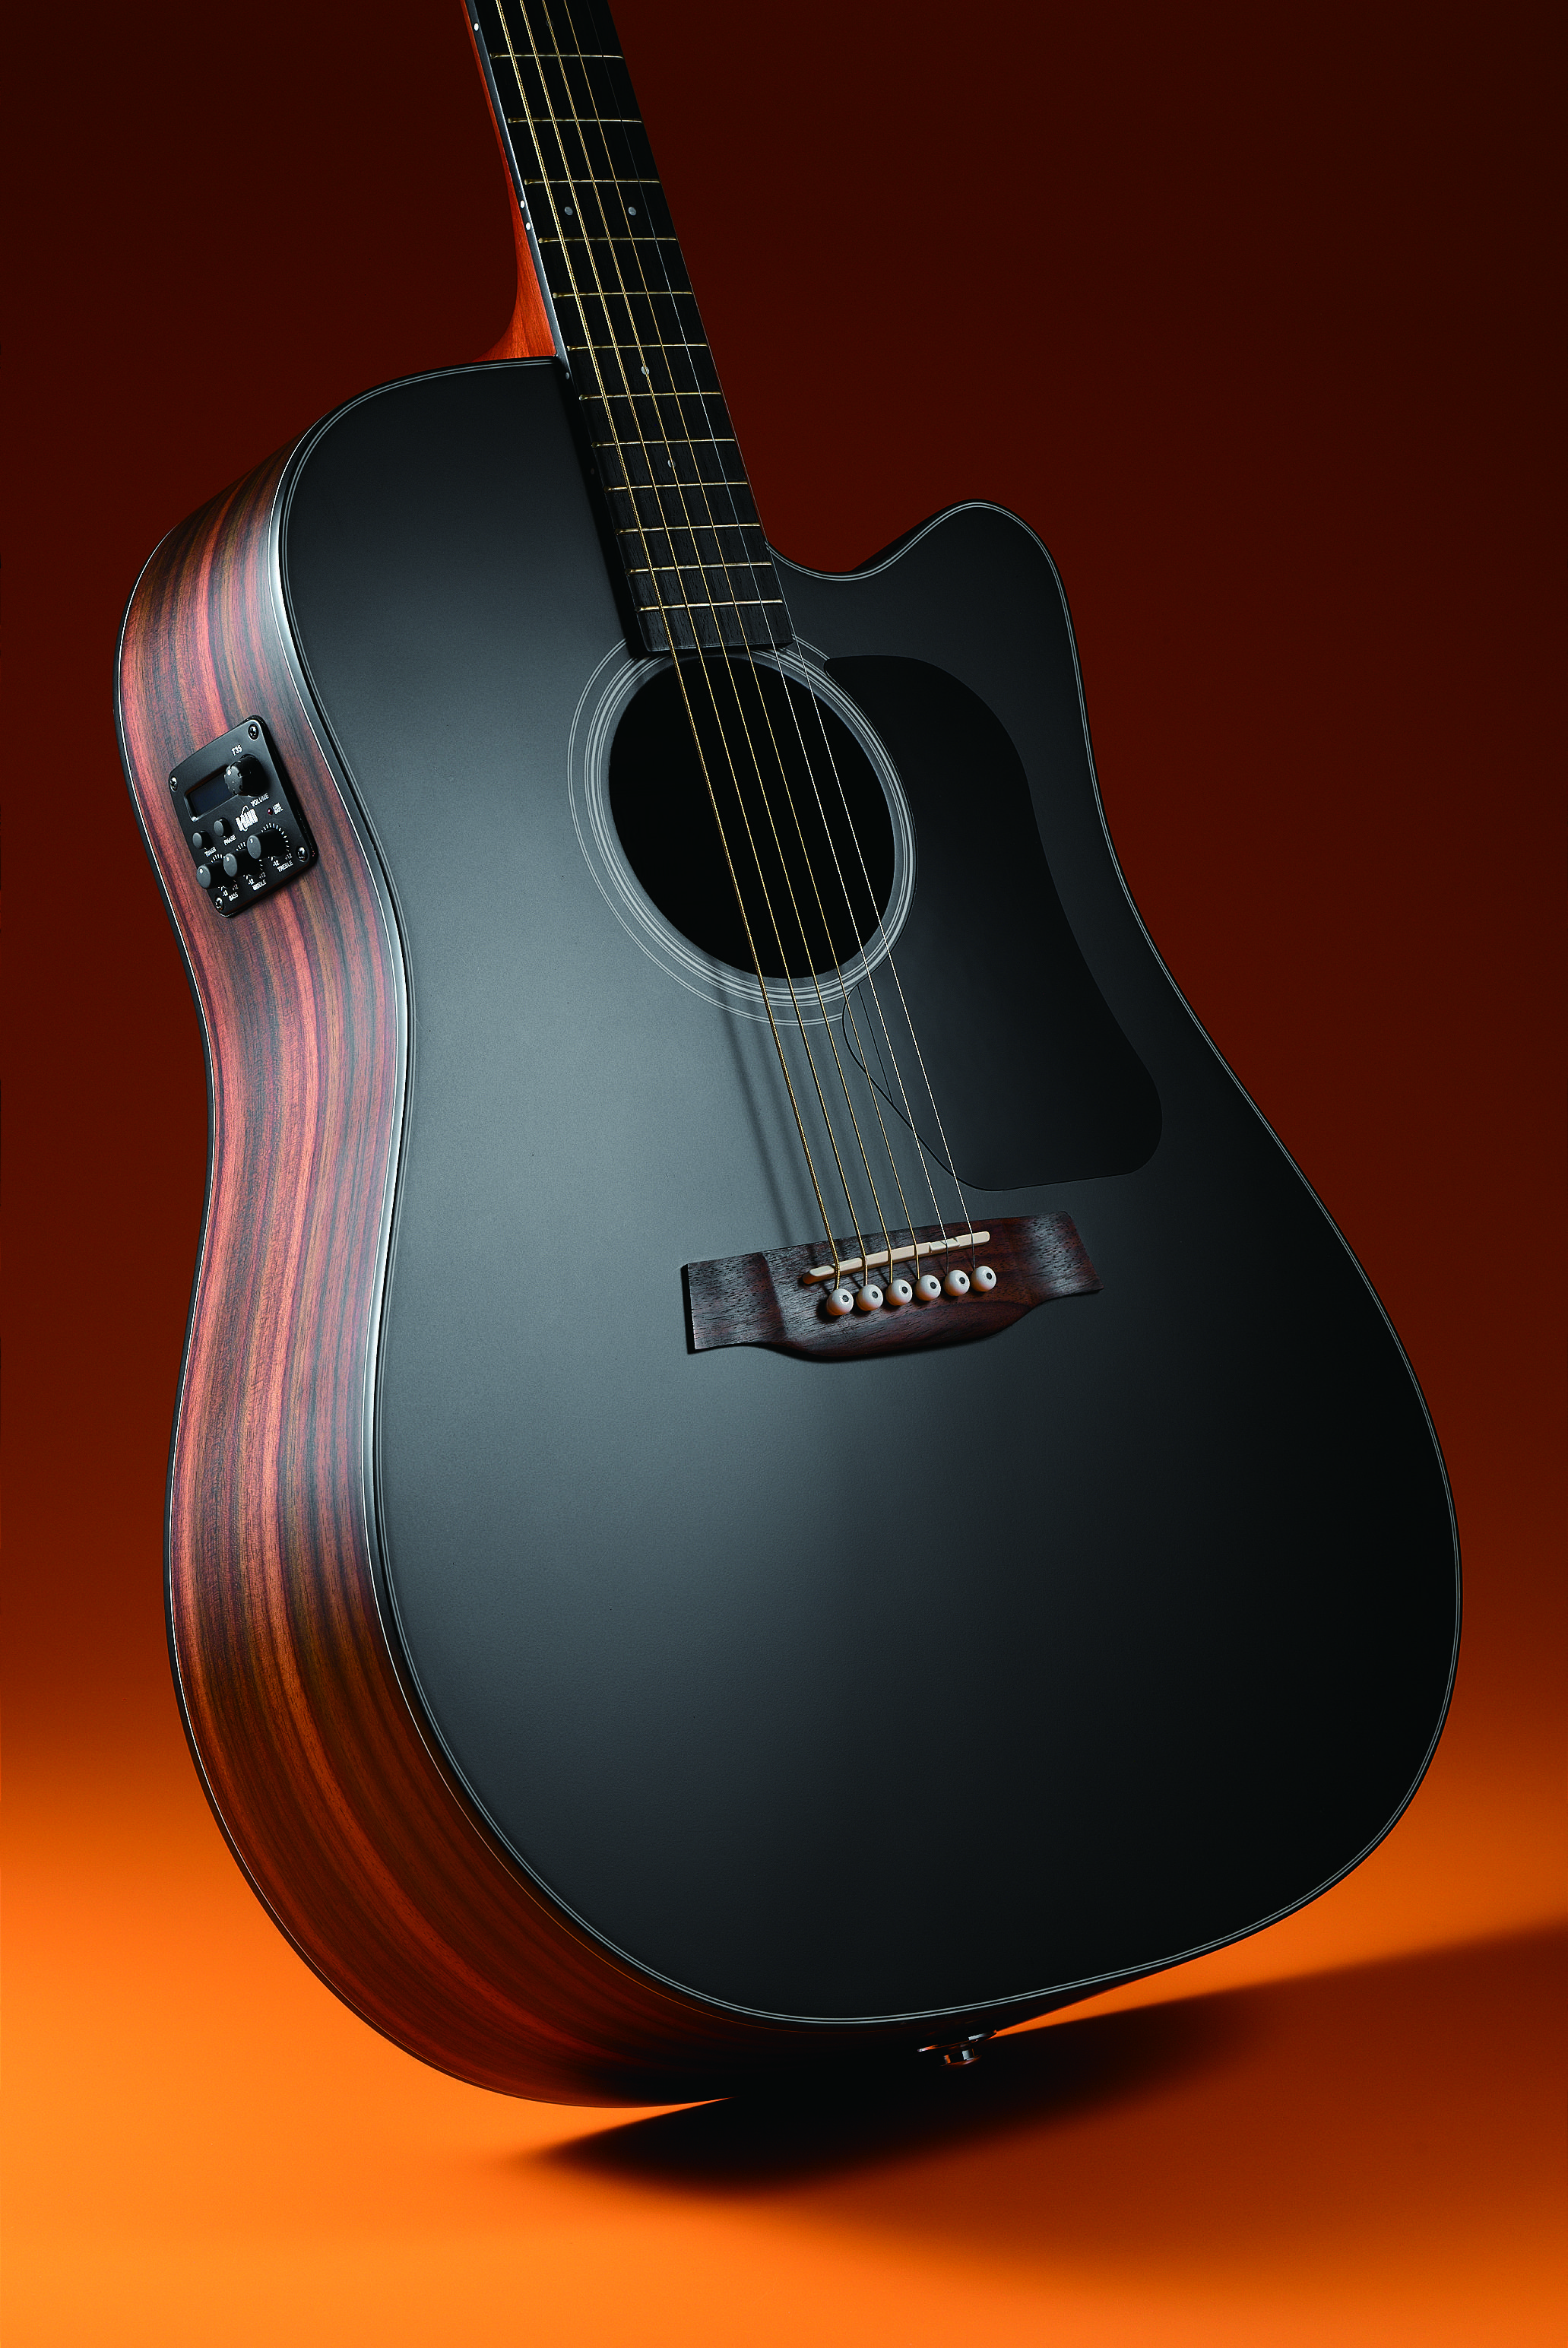 Walden Limited Edition The Black Guard D560ceb Acoustic Electric Guitar Guitar Music Guitar Guitar Design